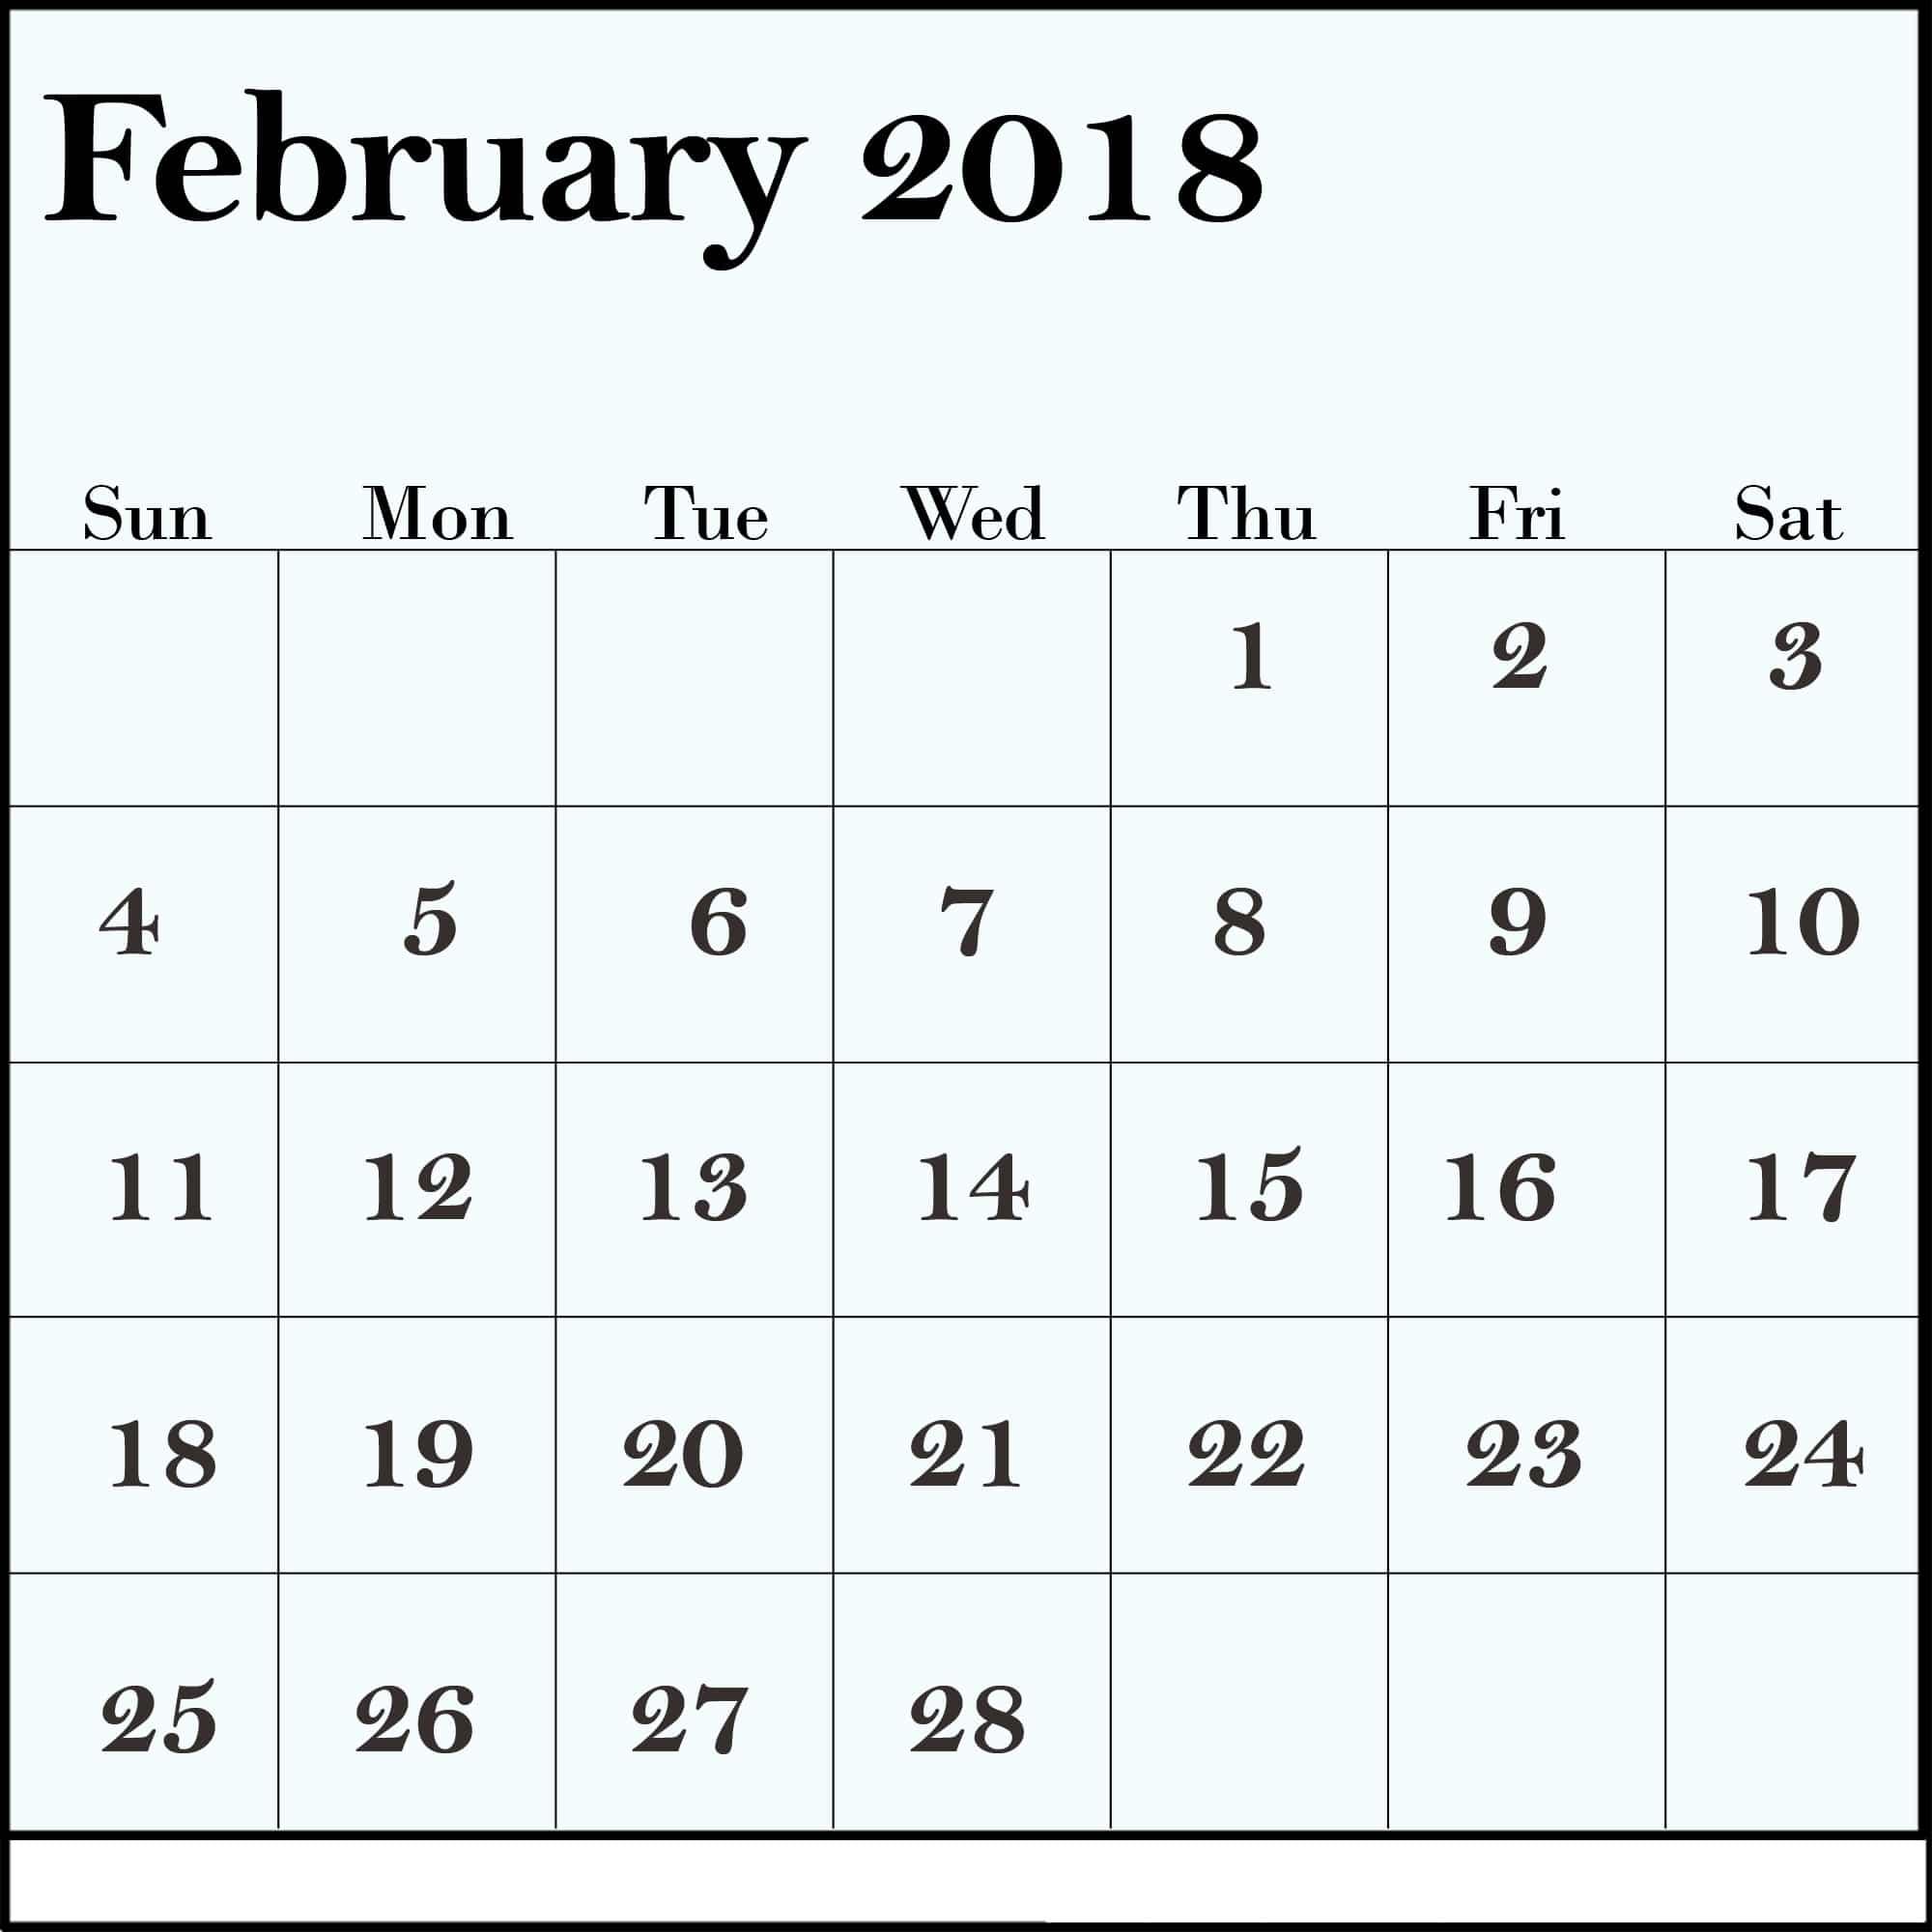 Calendar February 2018 Template free portraits